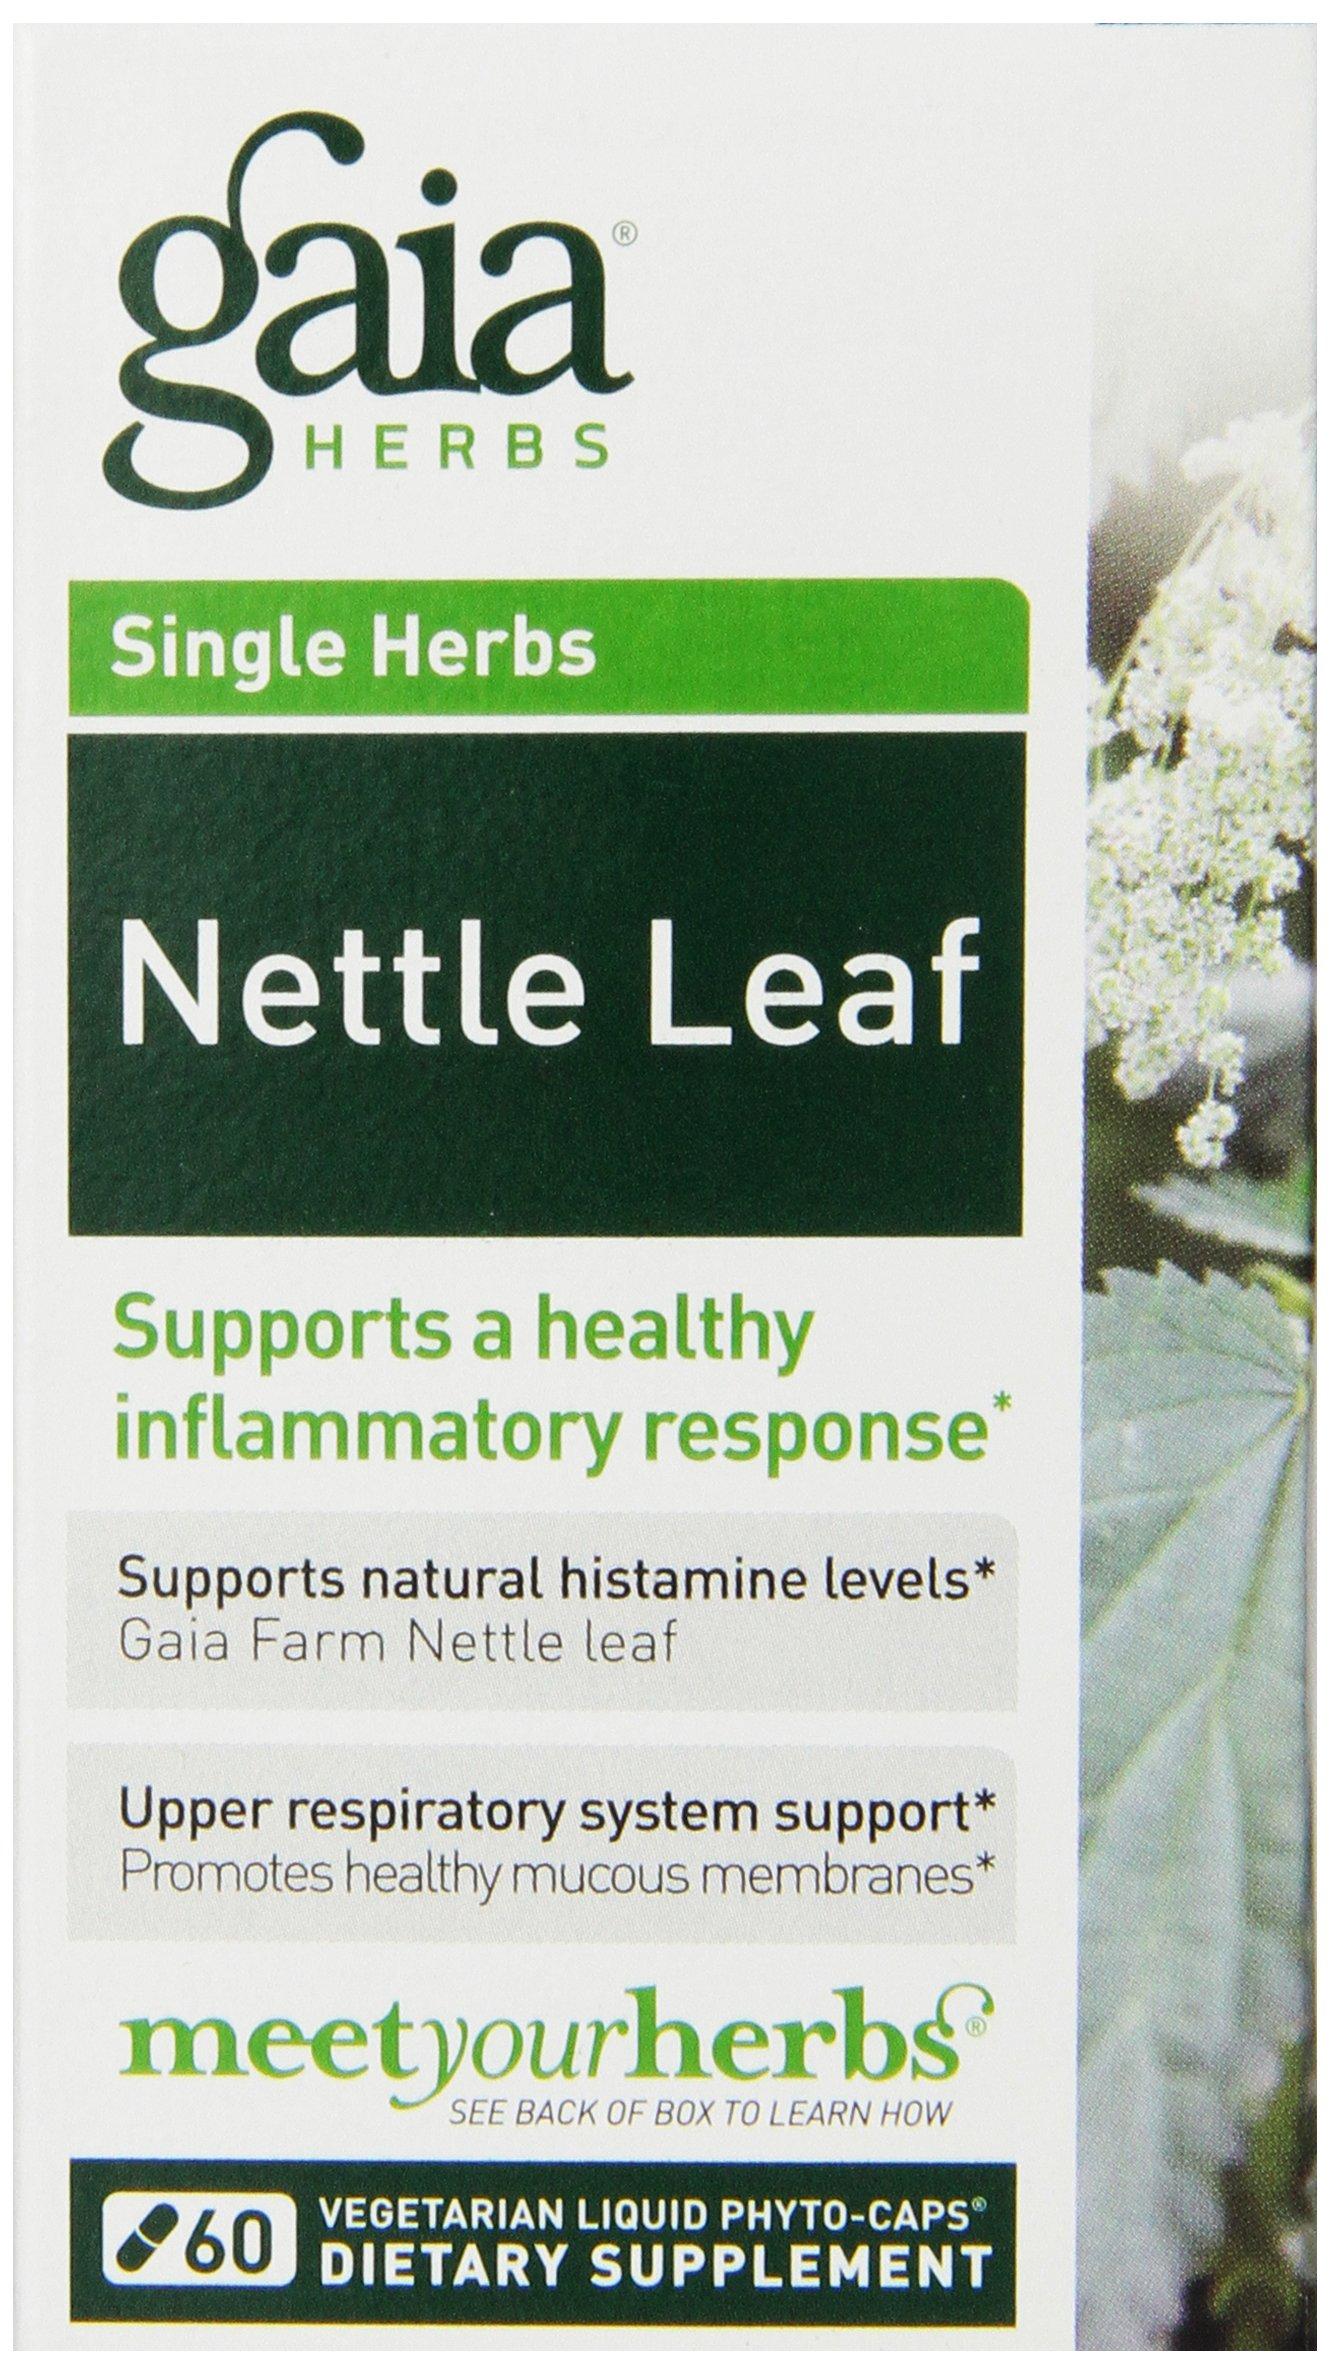 Gaia Herbs Nettle Leaf Liquid Phyto-Capsules, 60 Count